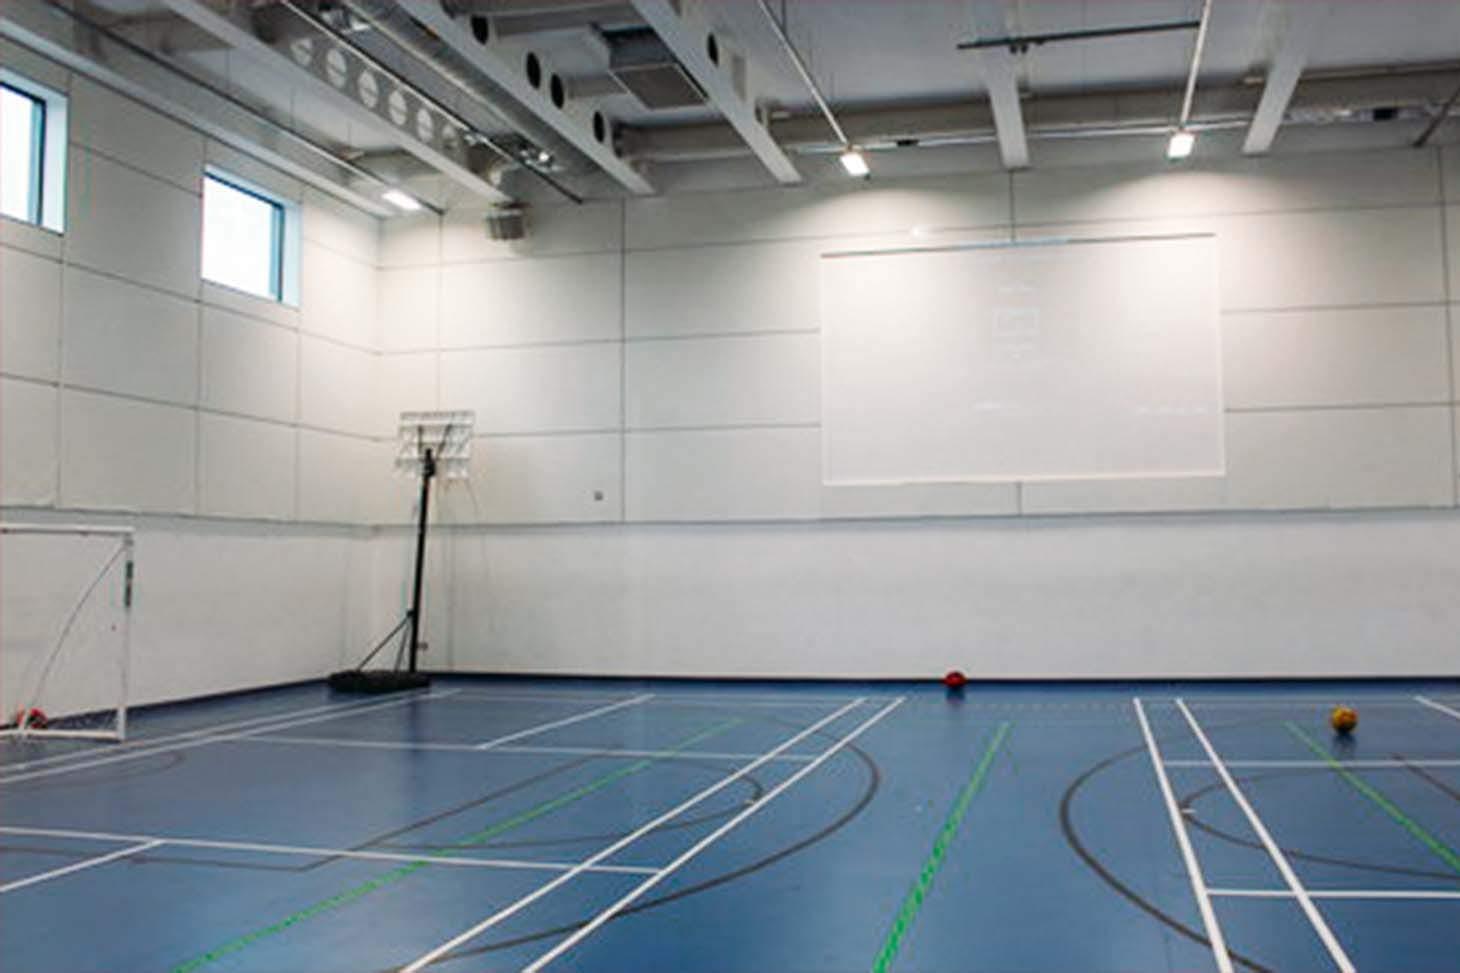 Sir Simon Milton Westminster UTC Indoor badminton court